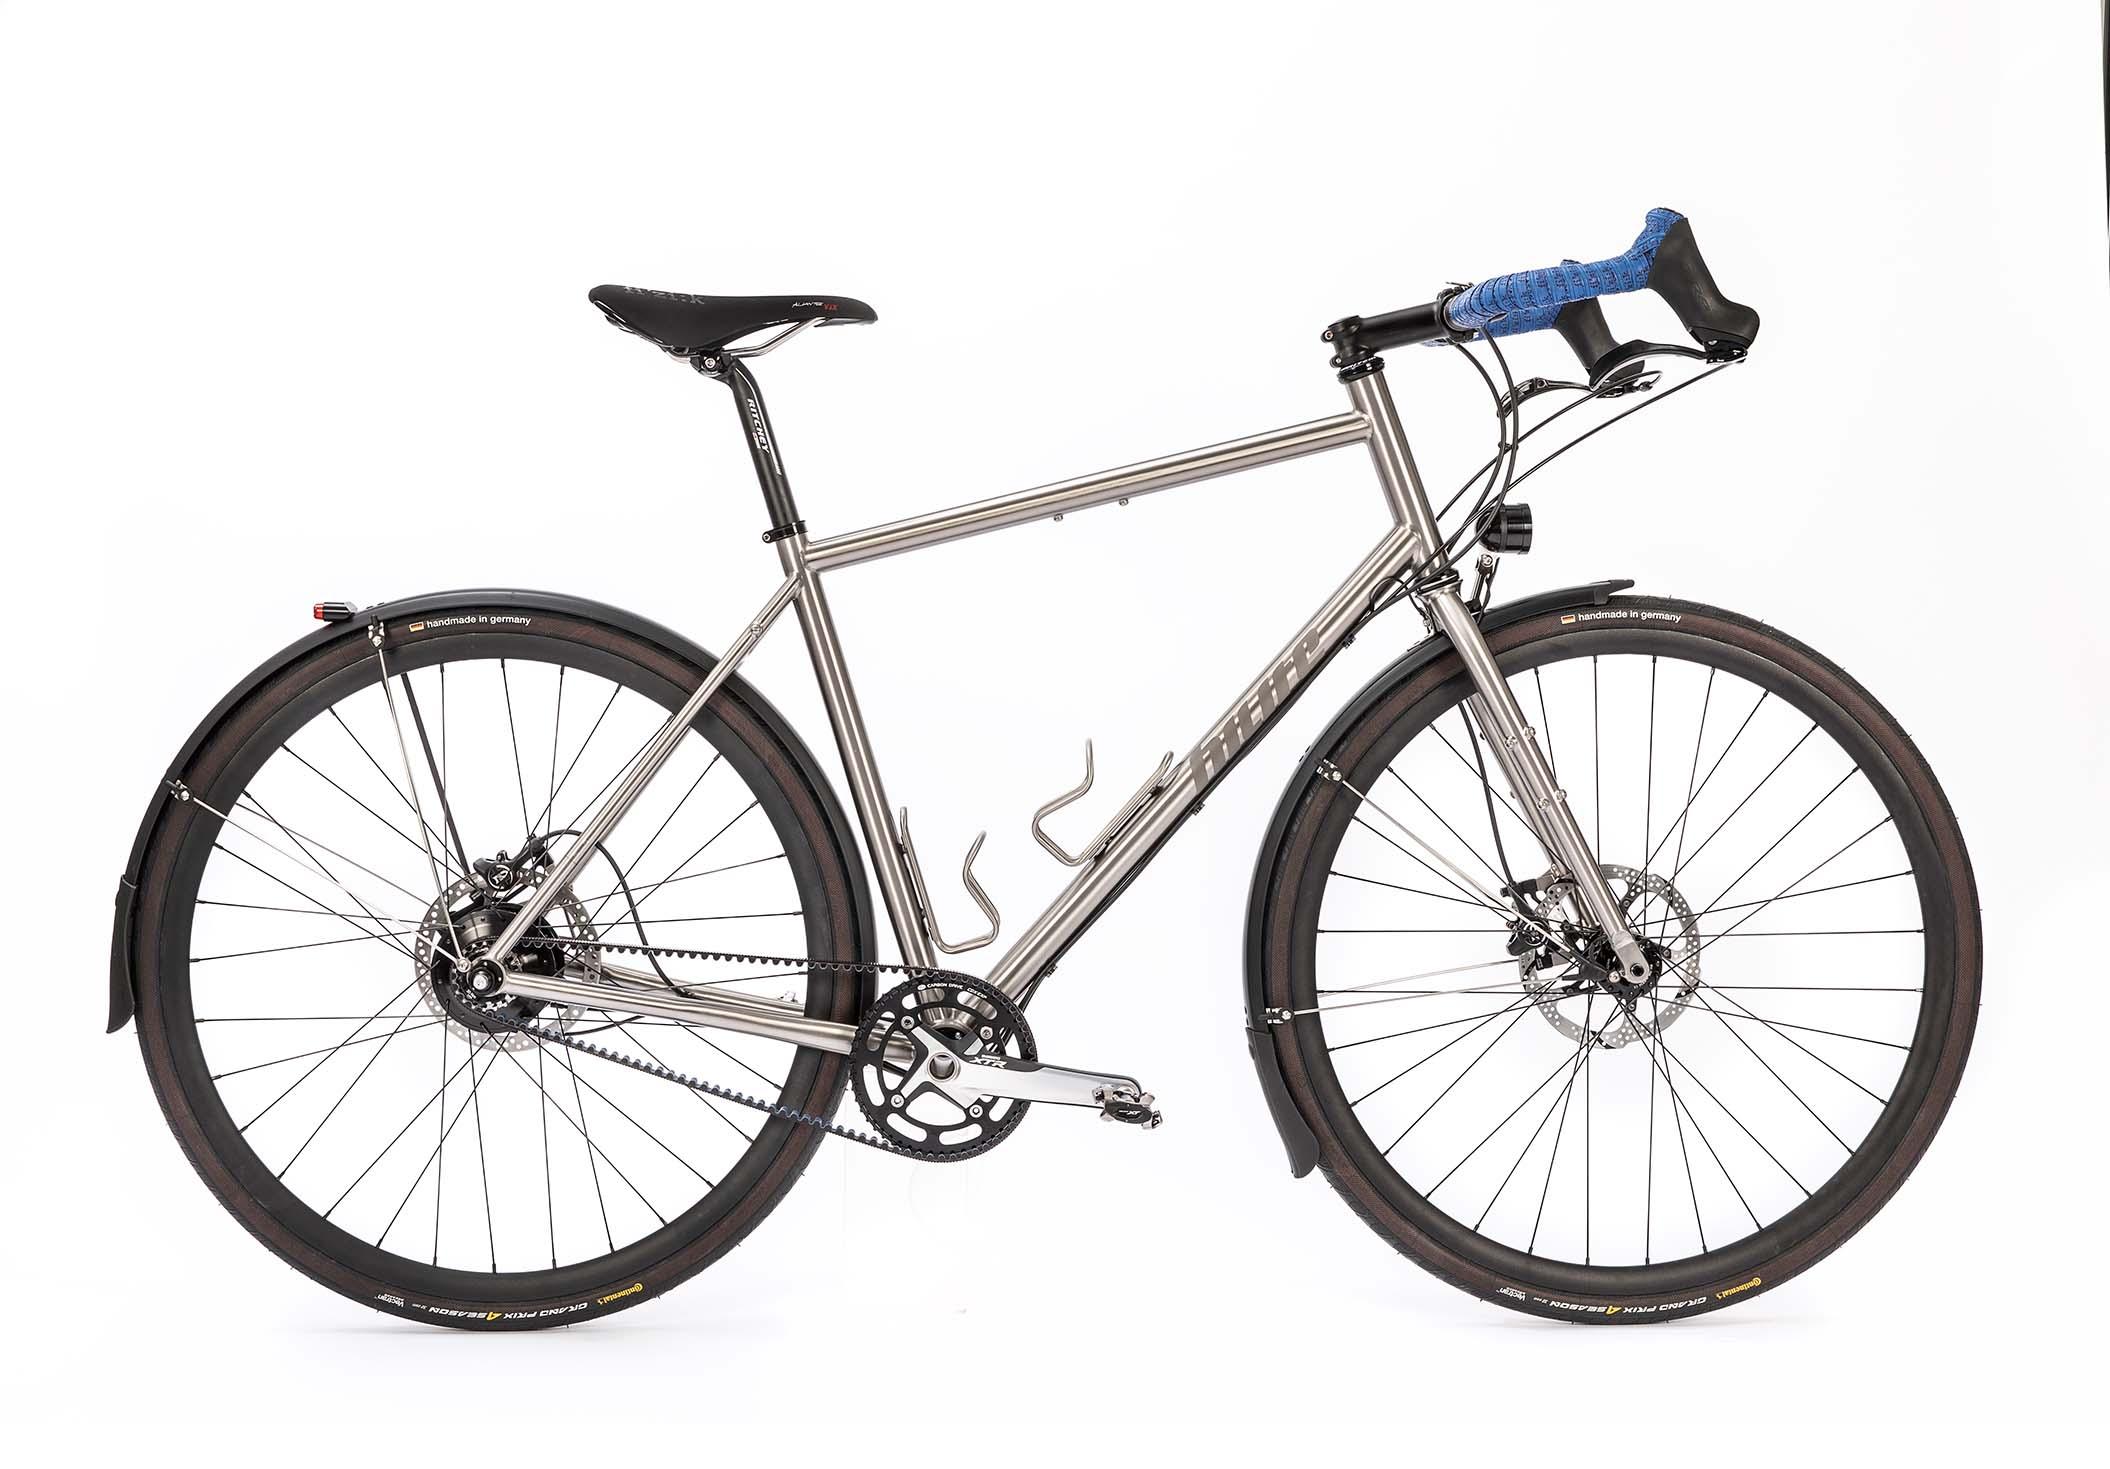 Rohloff Randonneur & Gravel Titan Fahrrad_1